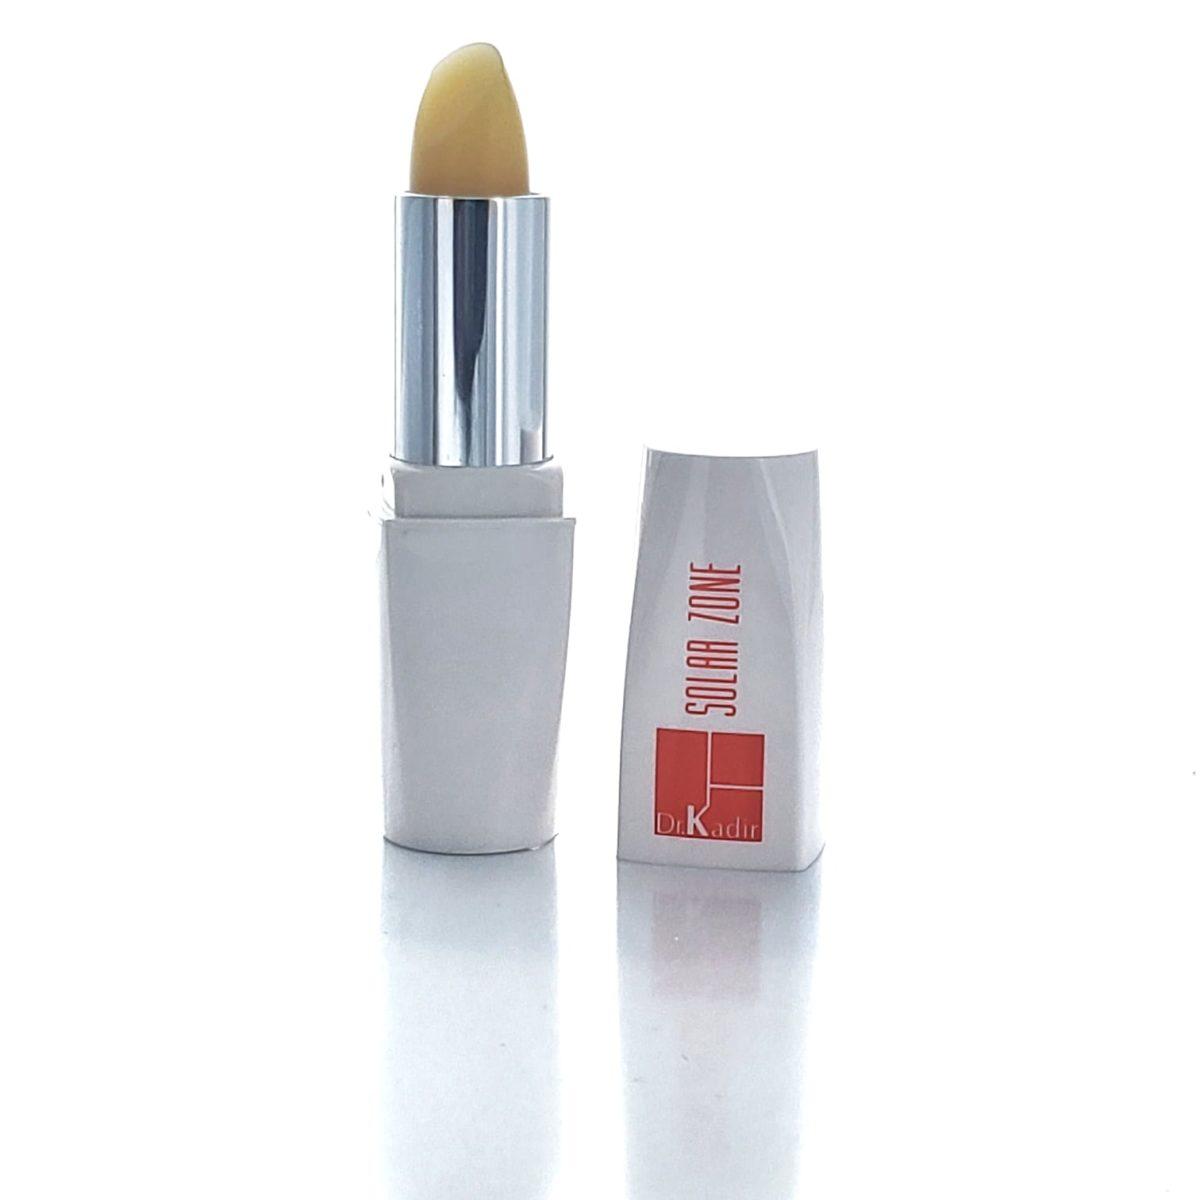 Lipstick protection